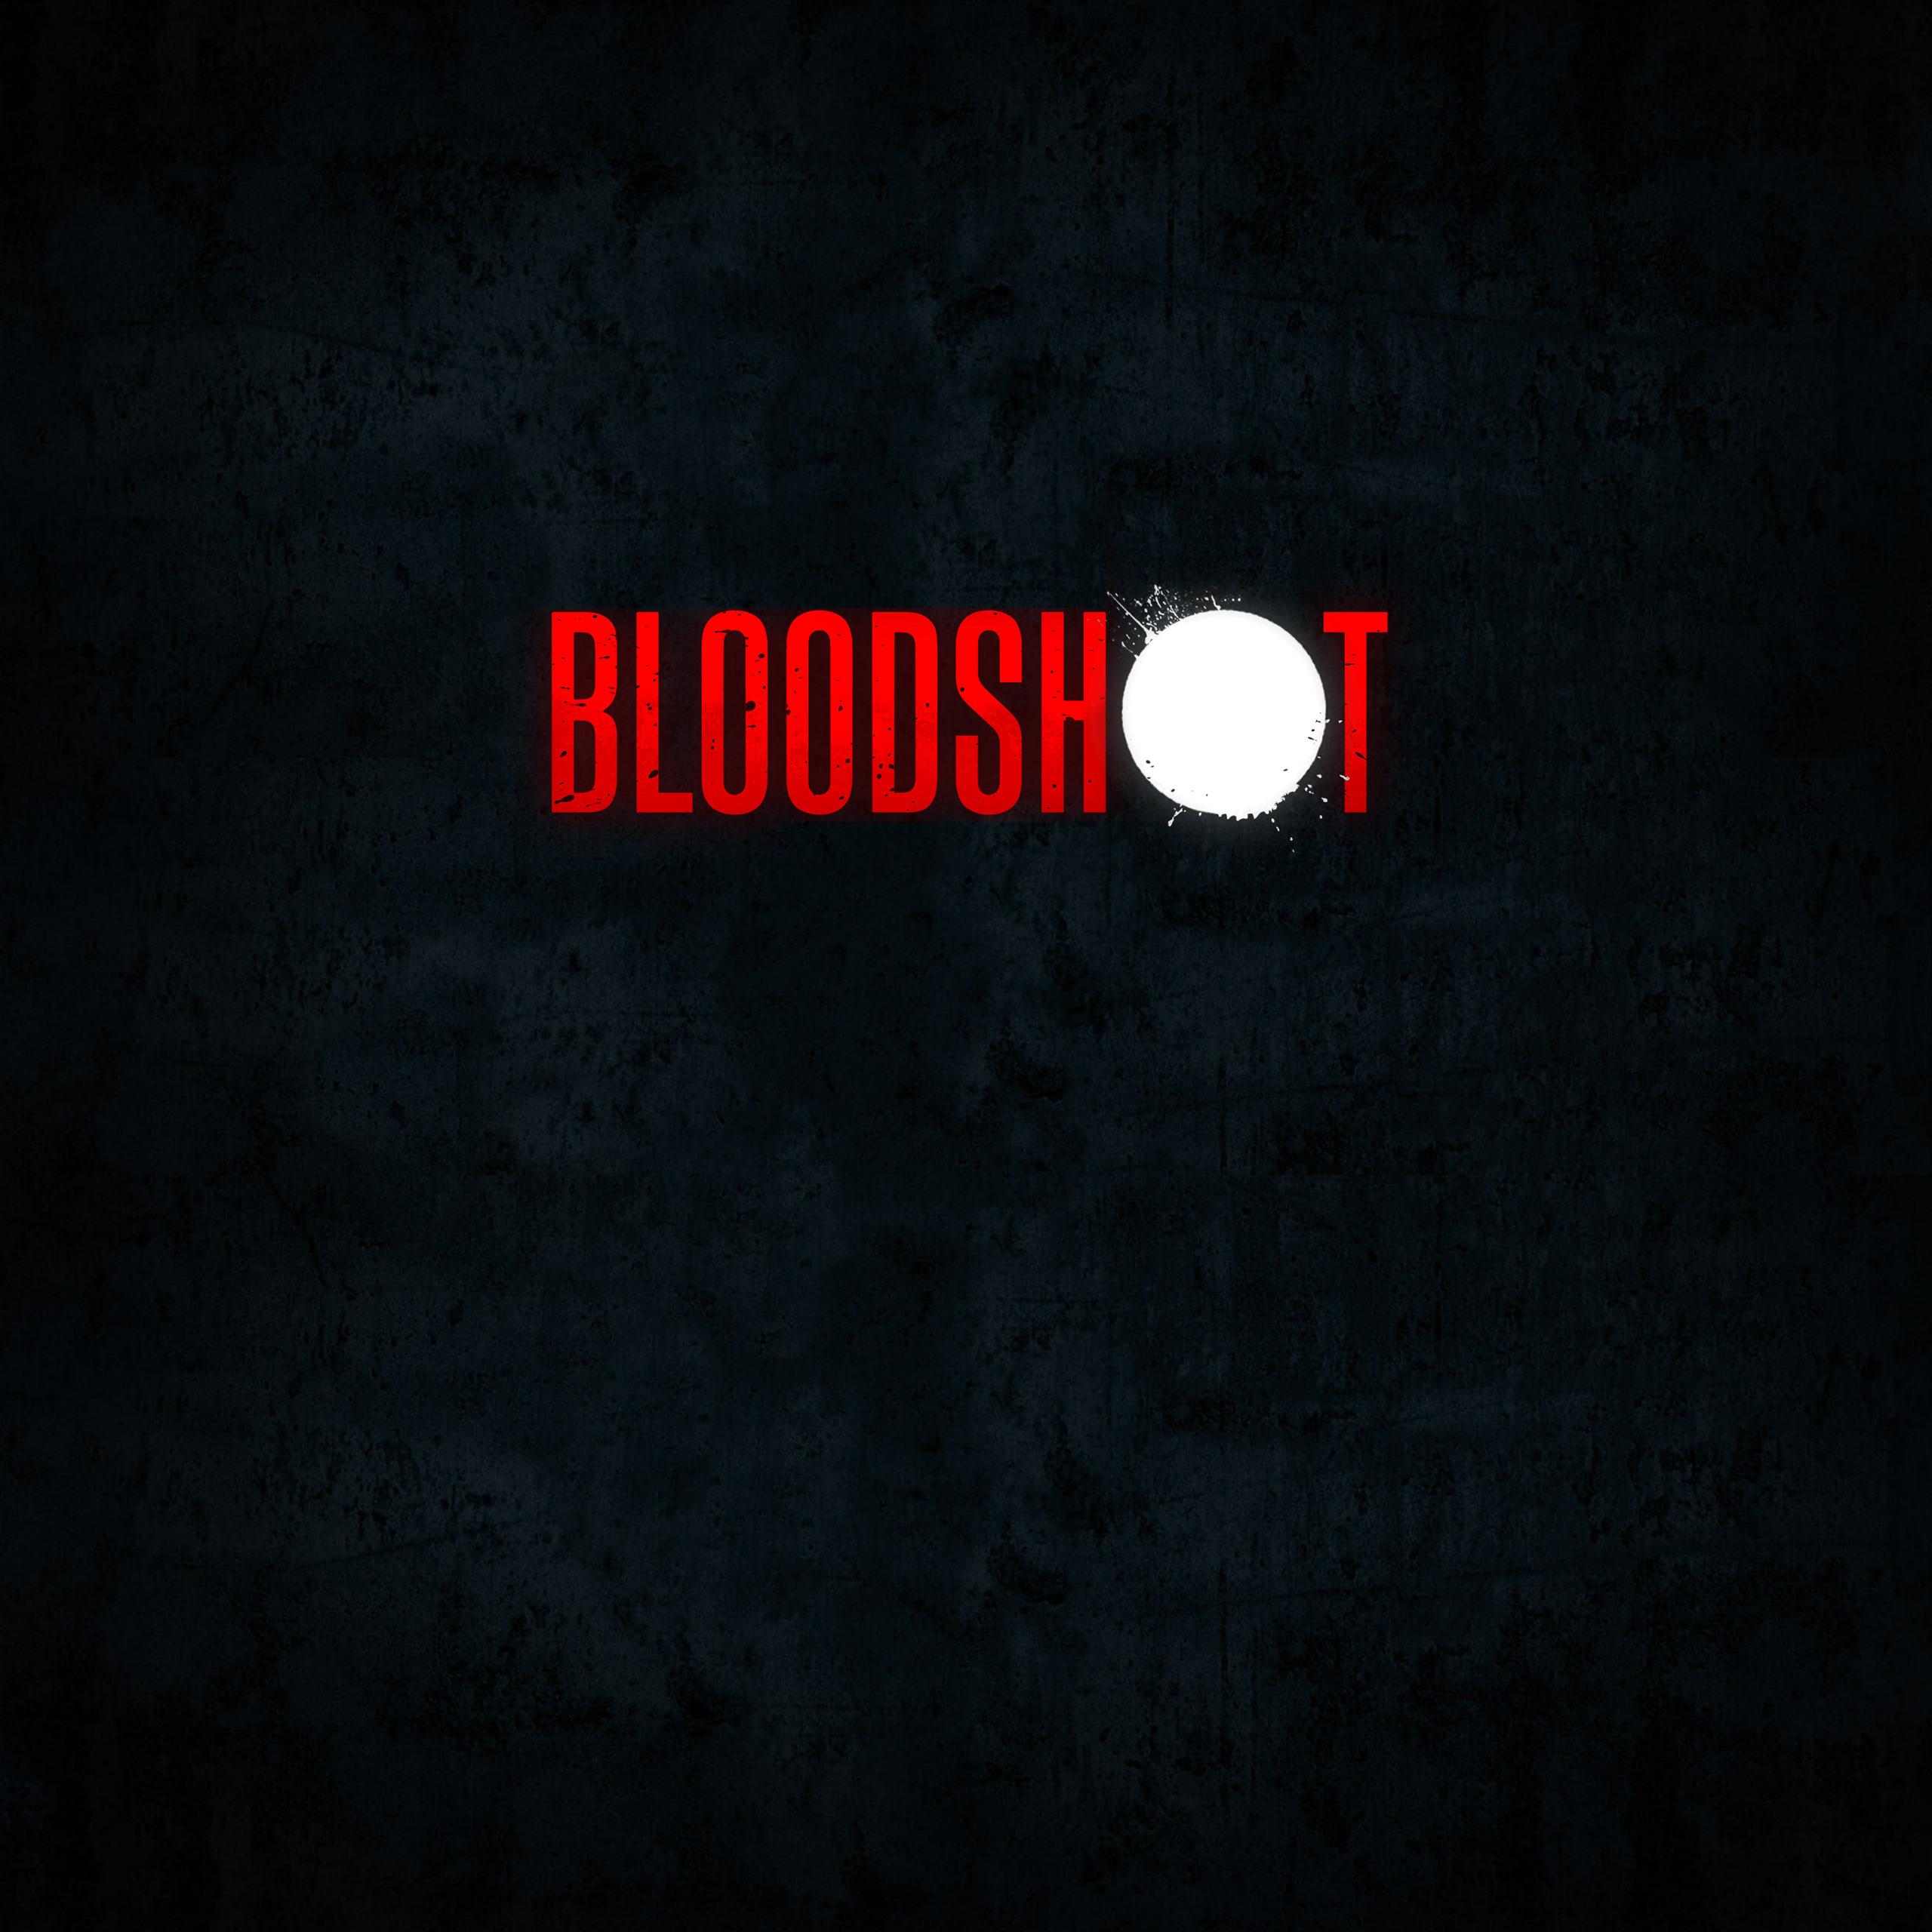 Bloodshot Movie Logo Wallpaper HD Movies 4K Wallpapers Images 2560x2560